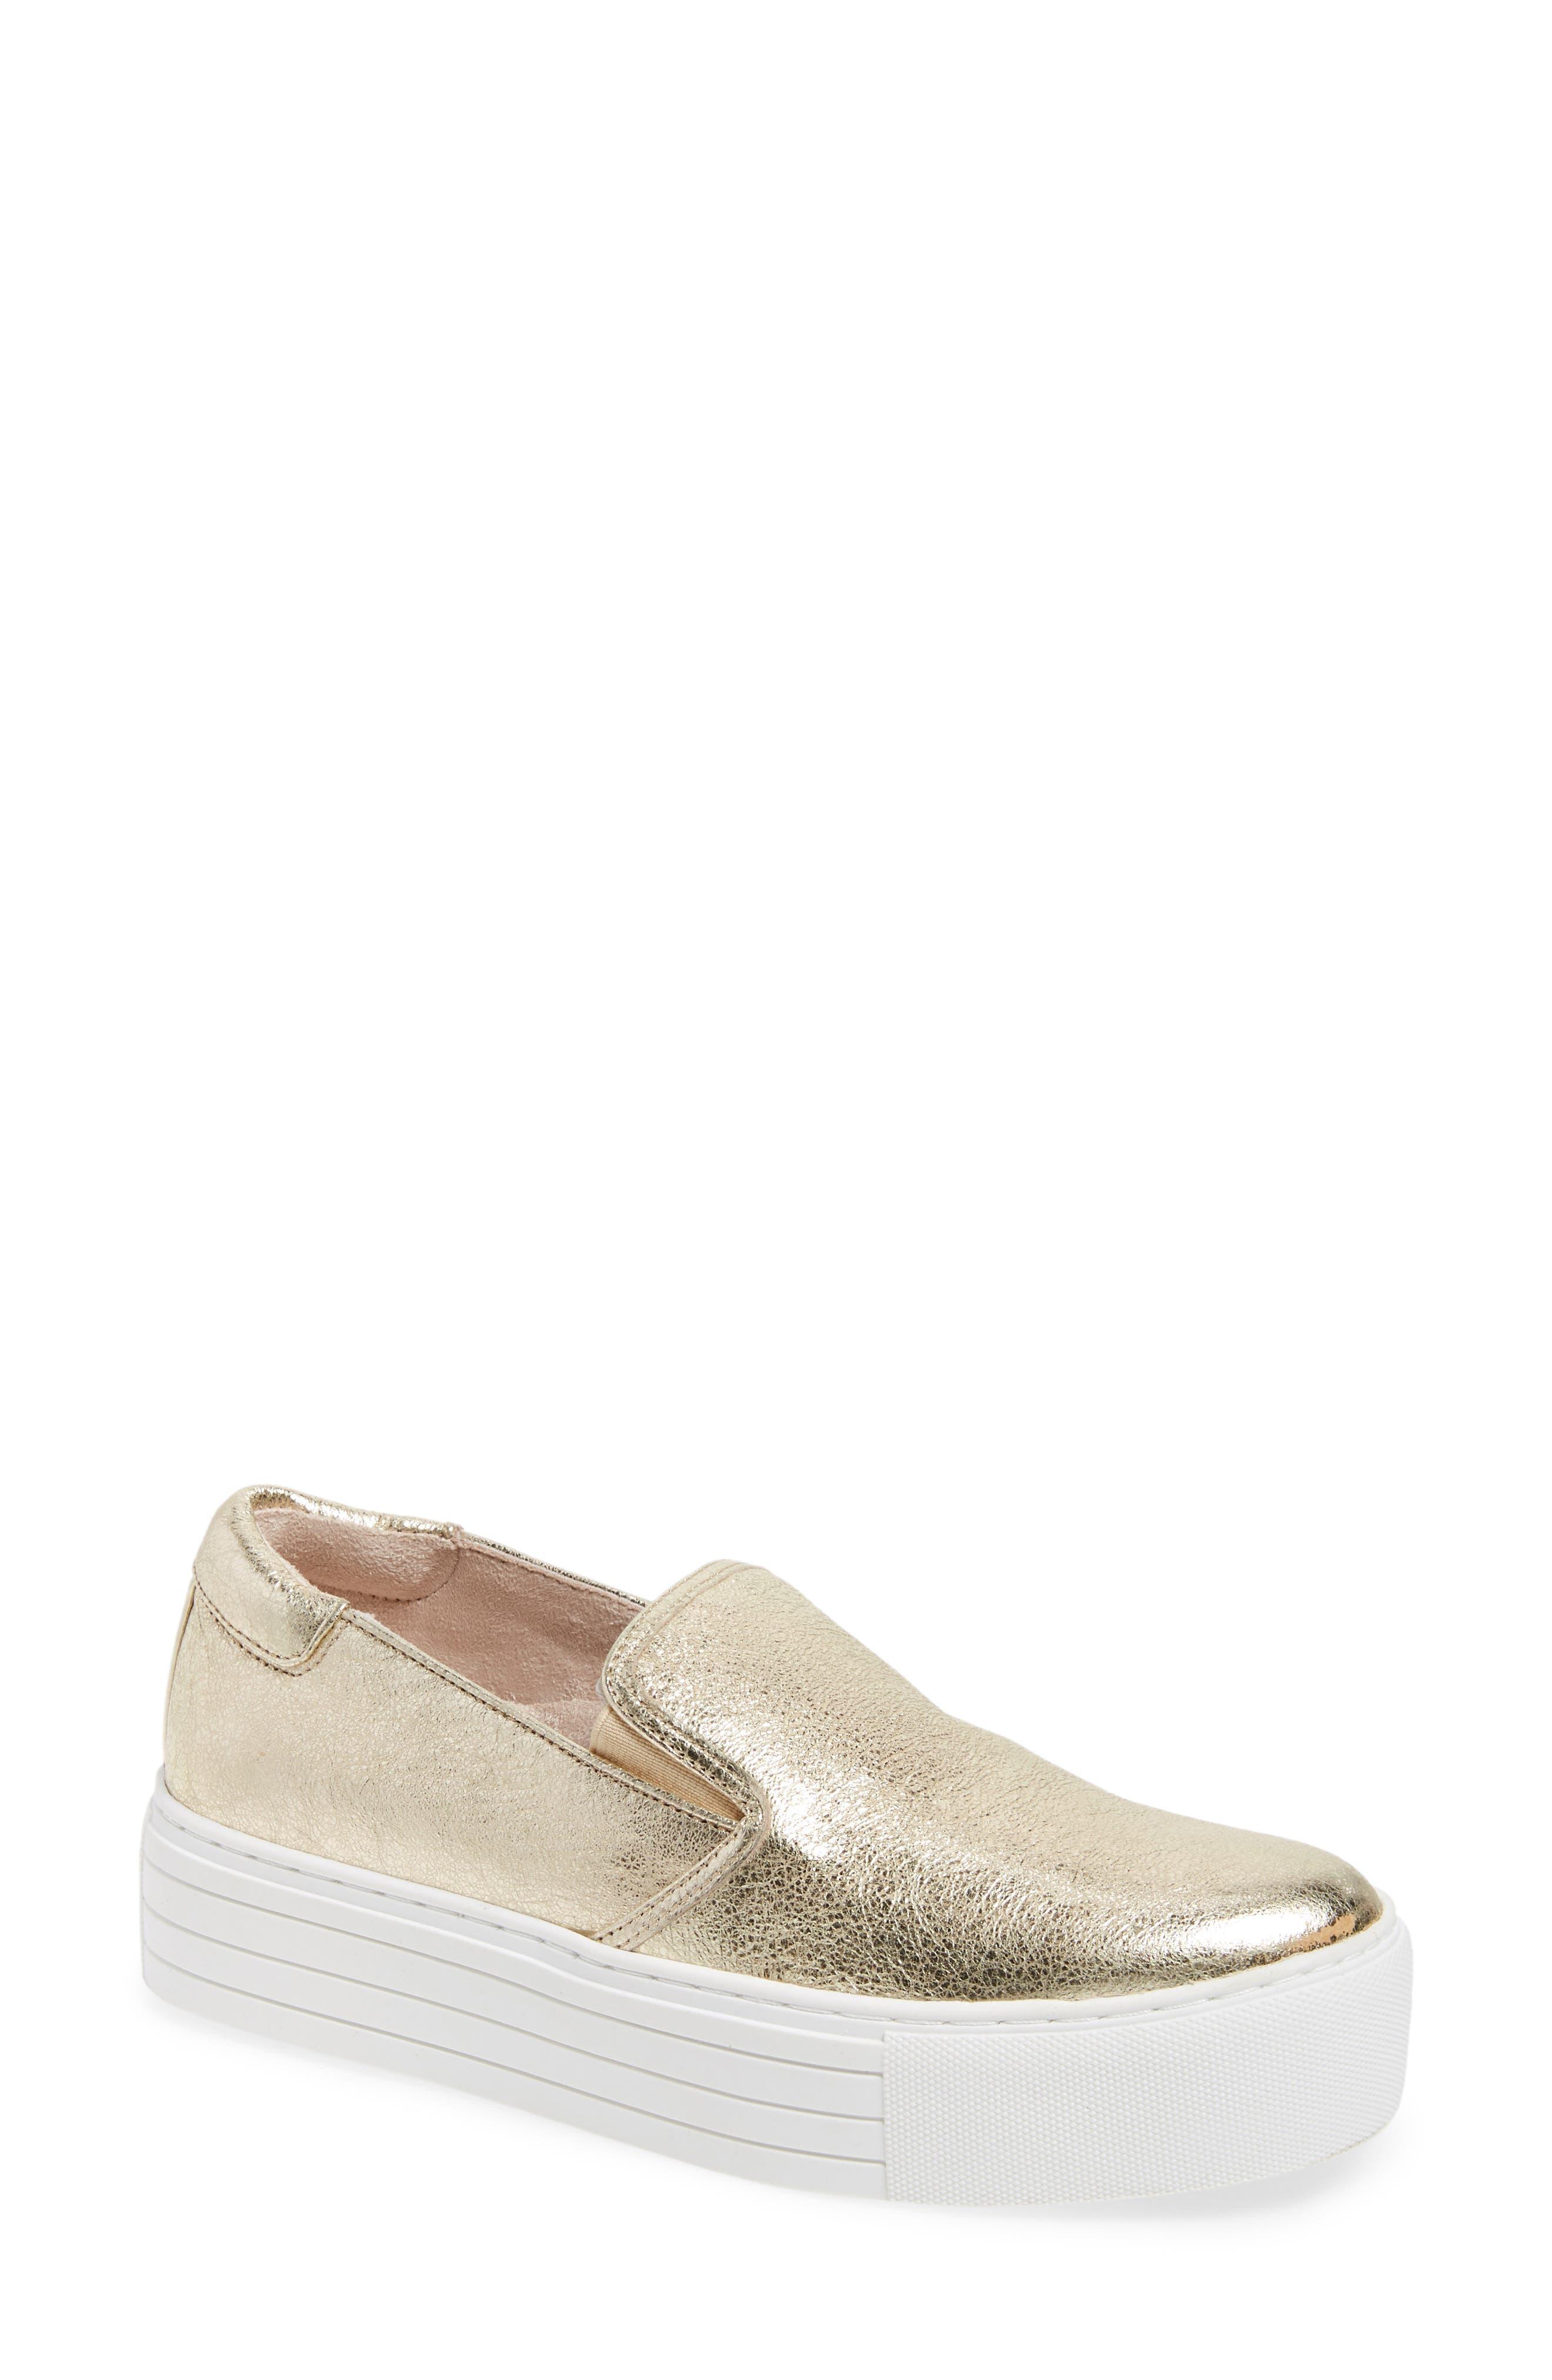 Joanie Slip-On Platform Sneaker,                             Main thumbnail 12, color,